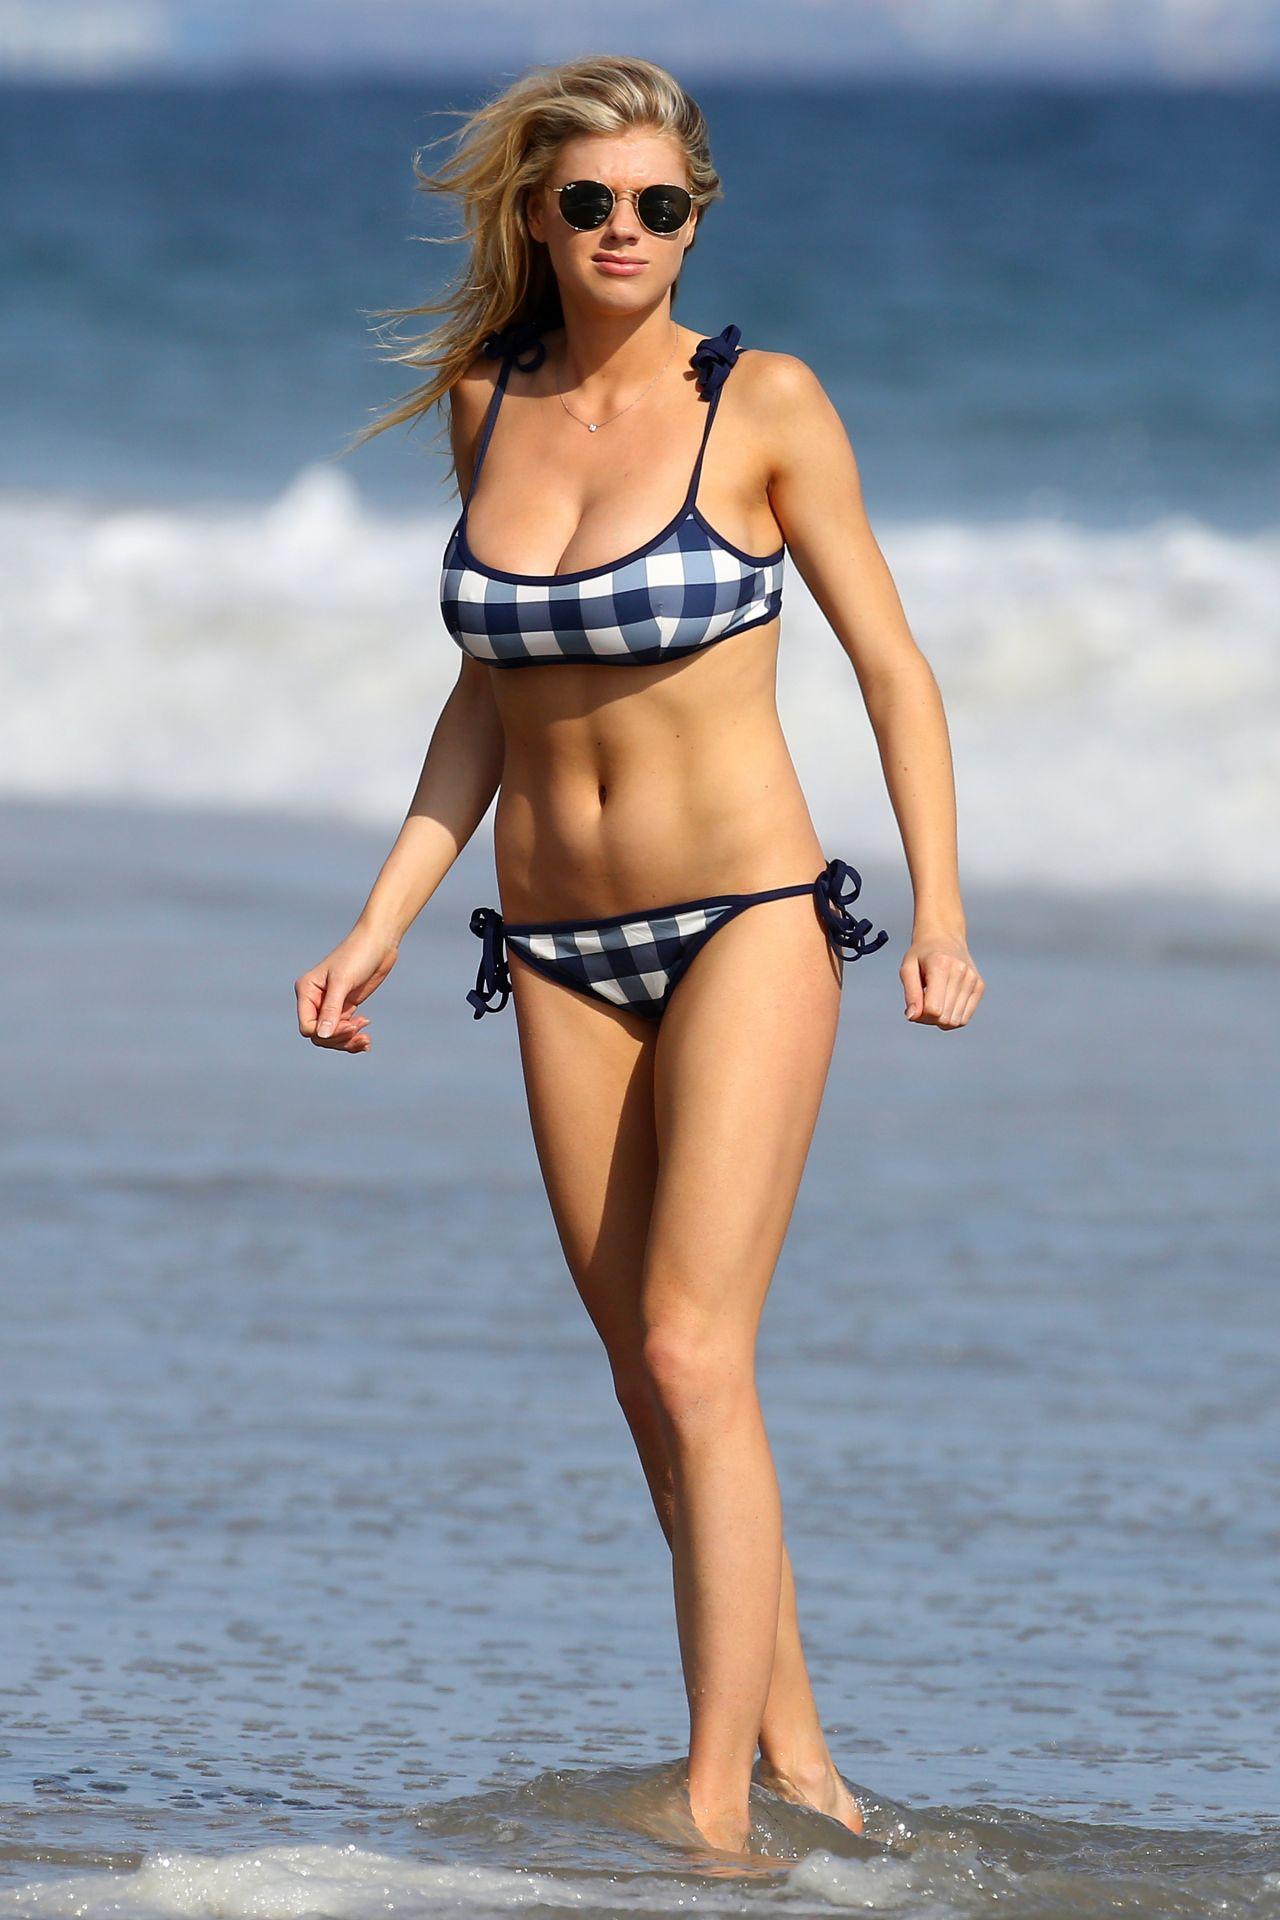 bikini Charlotte mckinney beach